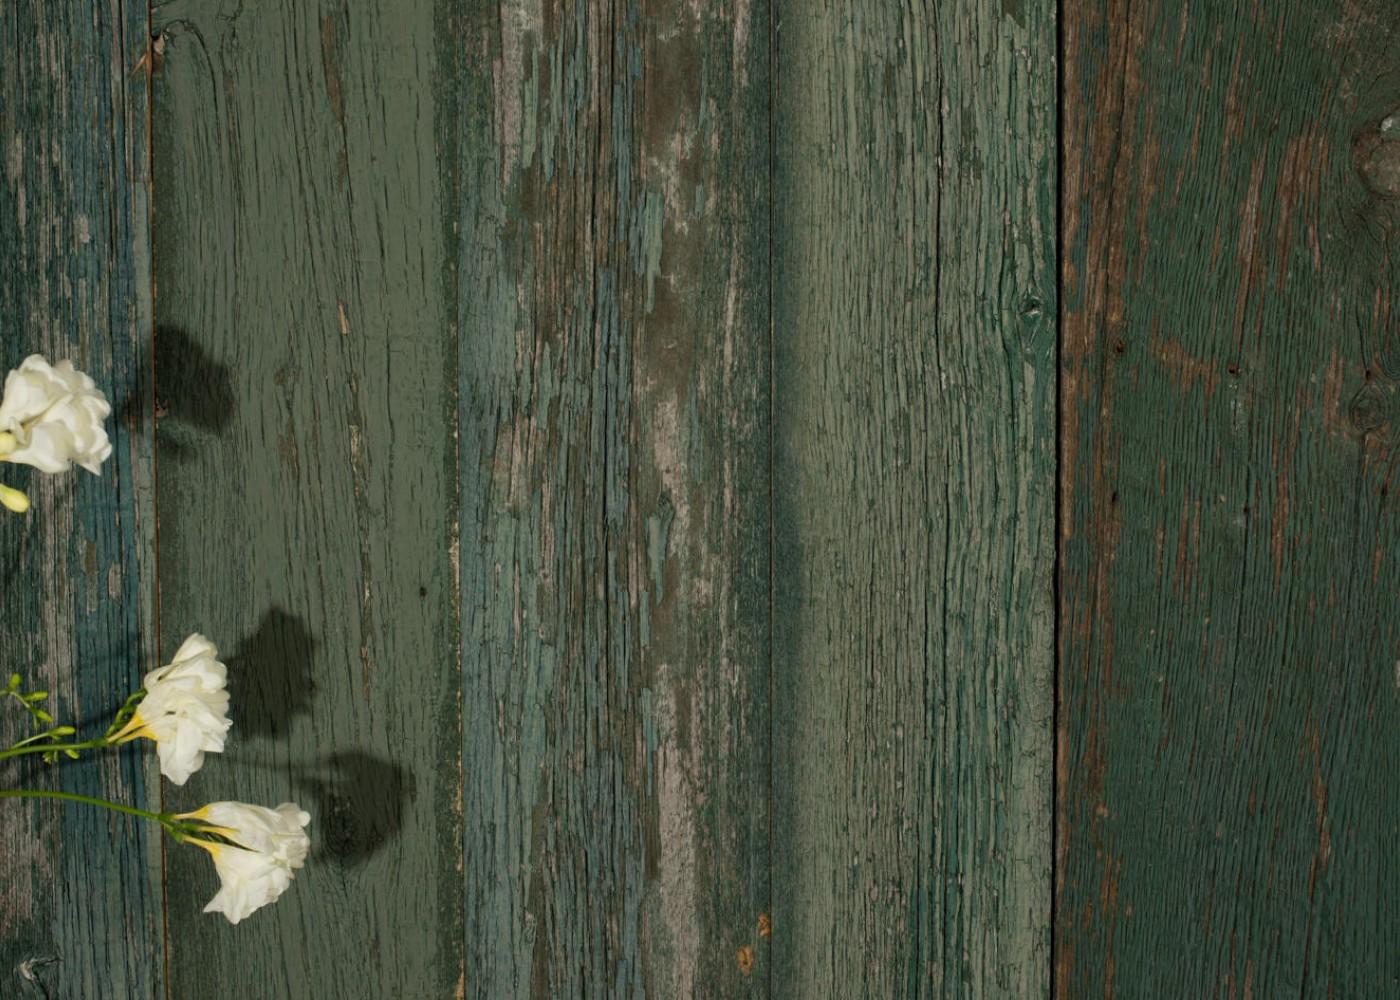 Bardage bois us rabot campagne vieilli peinture d 39 origine for Peinture bois vieilli